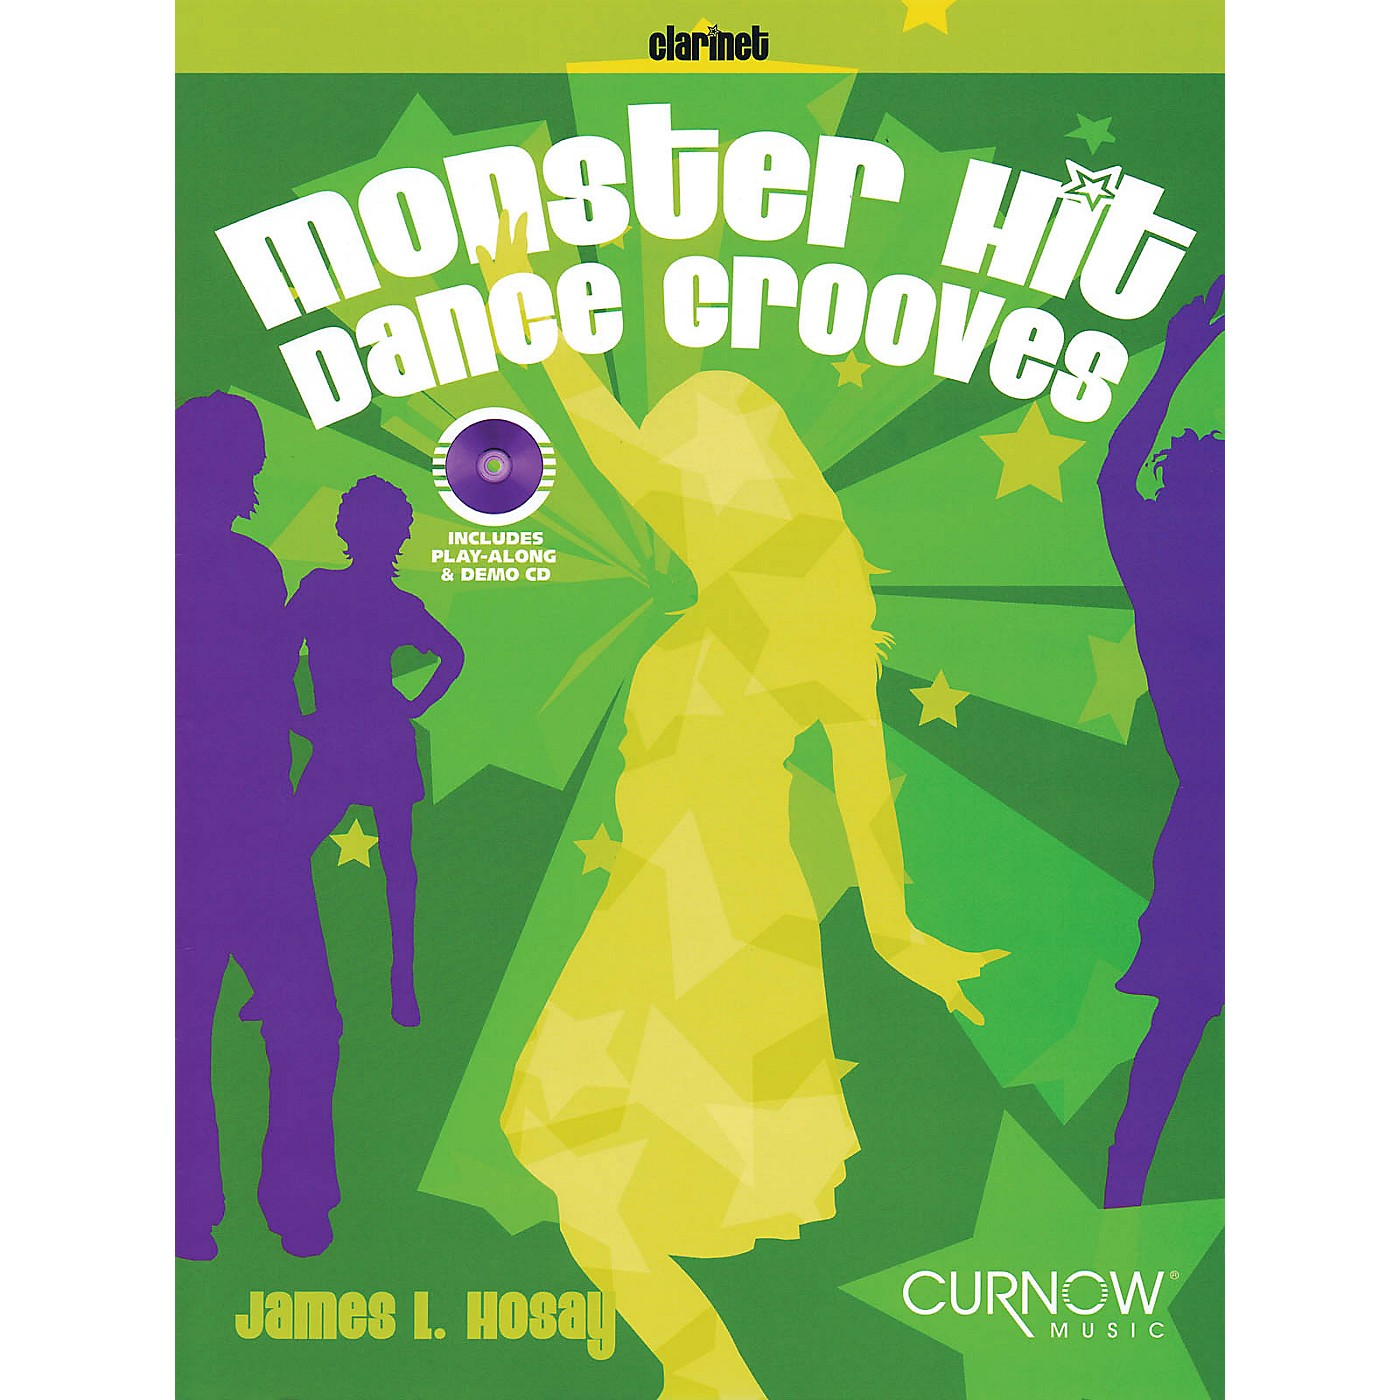 Curnow Music Monster Hit Dance Grooves (Flute) Concert Band thumbnail